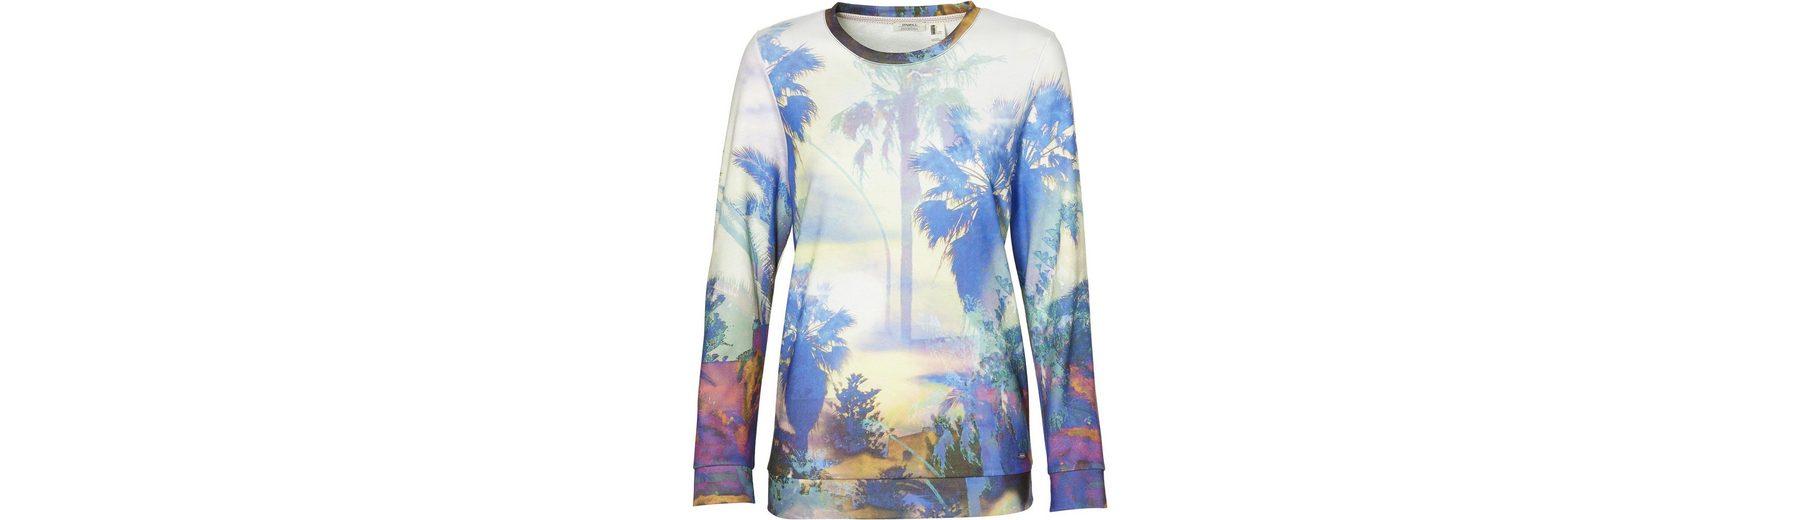 O'Neill Sweatshirt Summer print